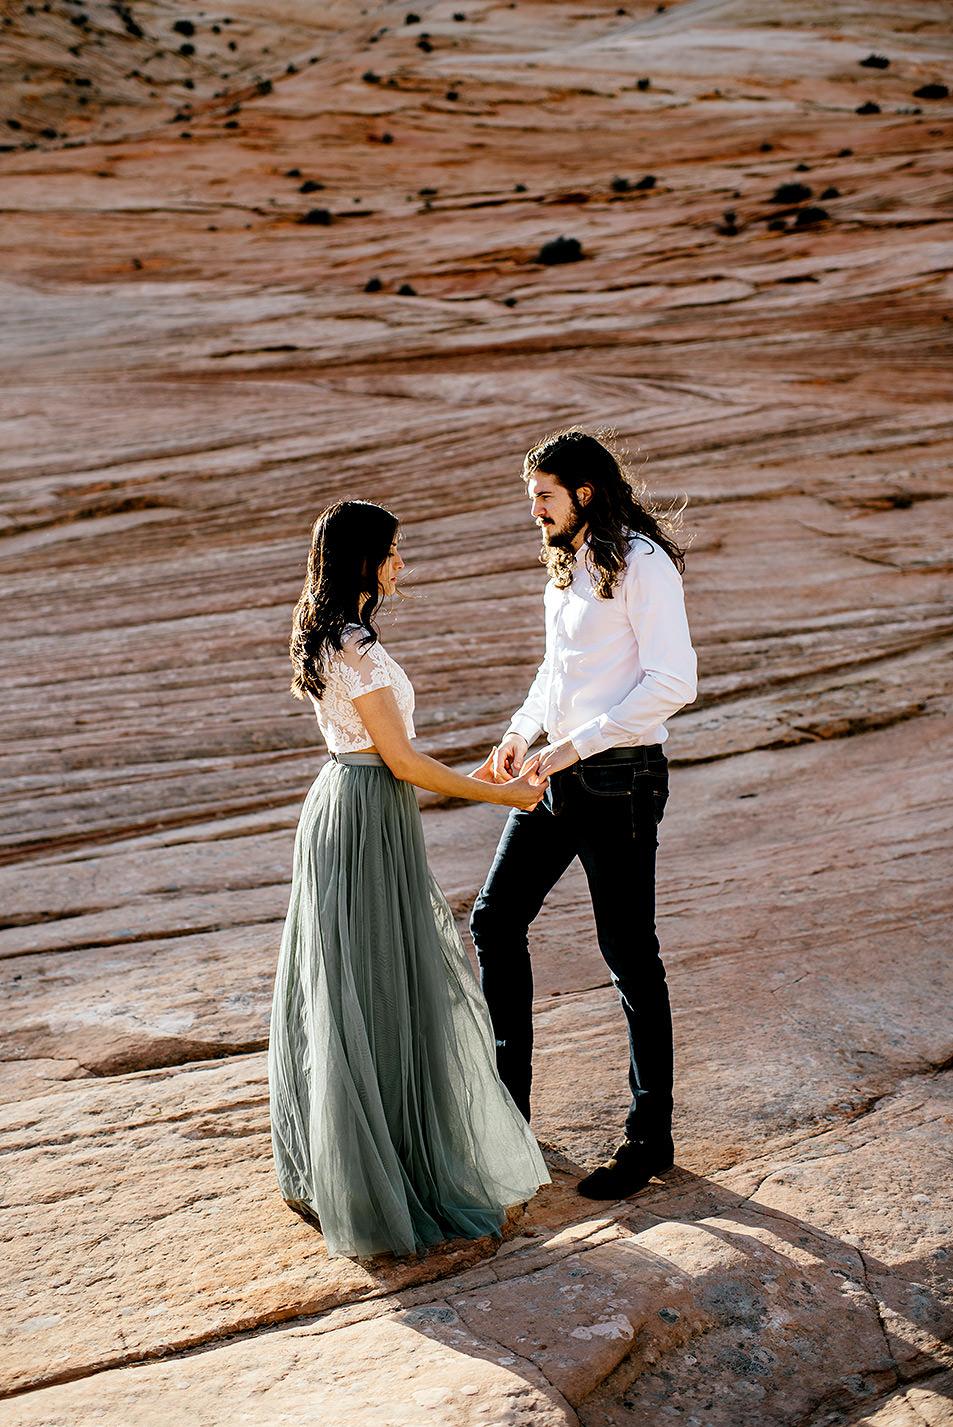 Zion_National_Park_Arizona_Wedding_Photographer_015.jpg